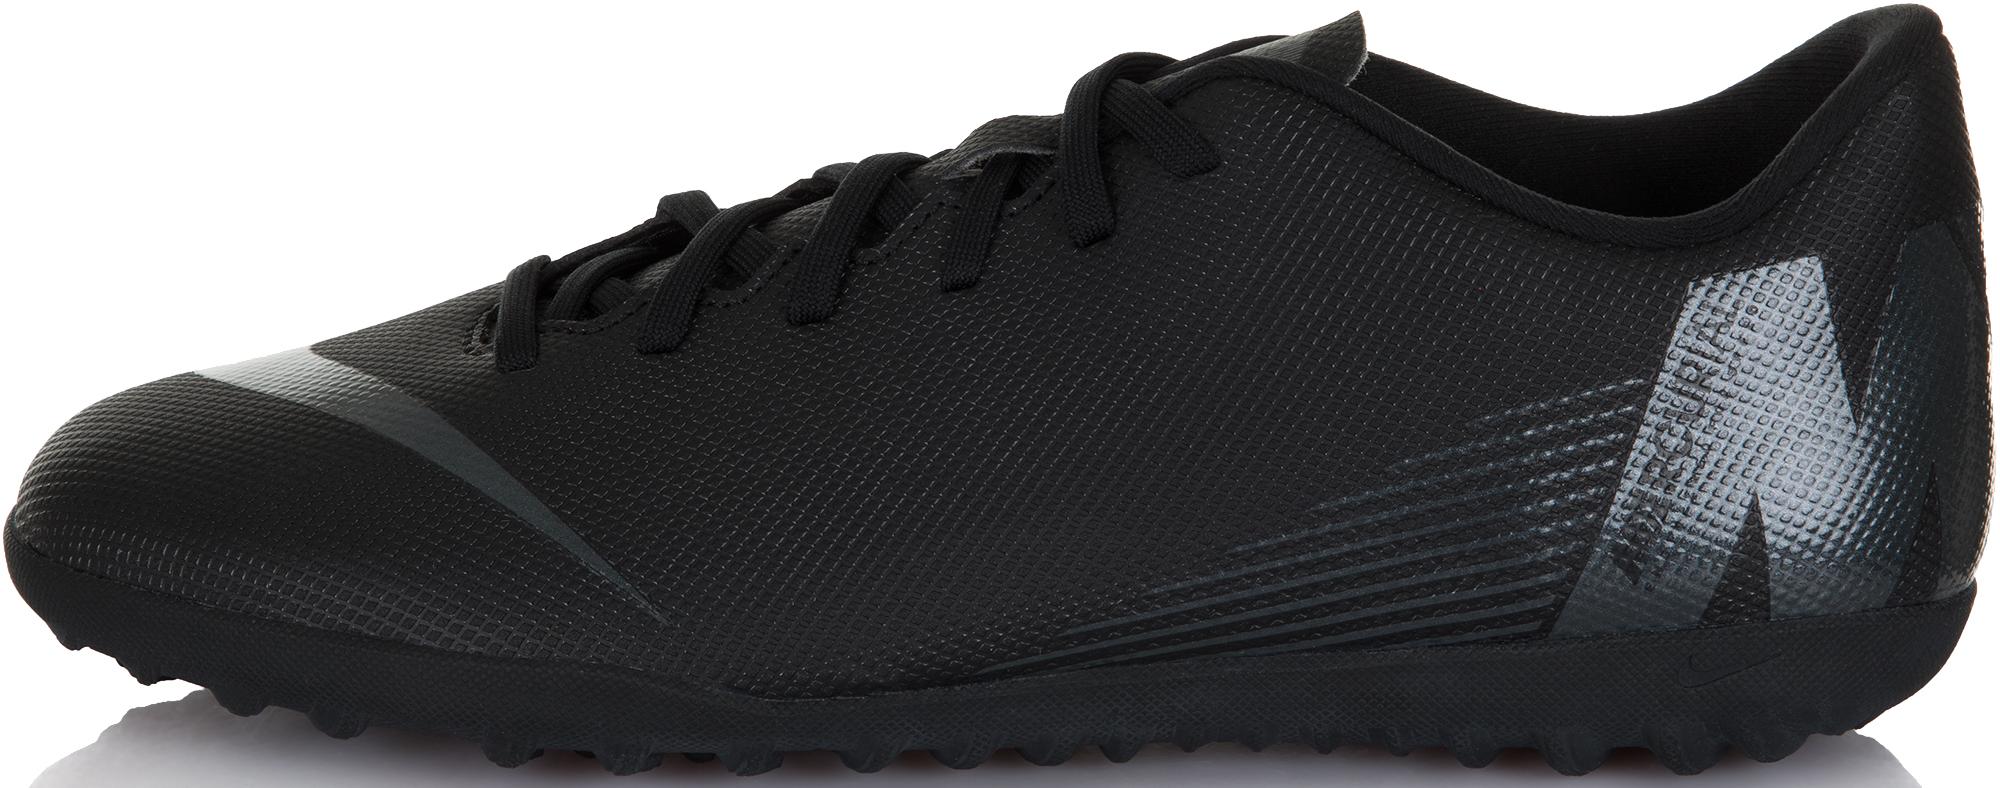 Nike Бутсы мужские Nike Mercurial VaporX 12 Club TF, размер 44,5 цена 2017